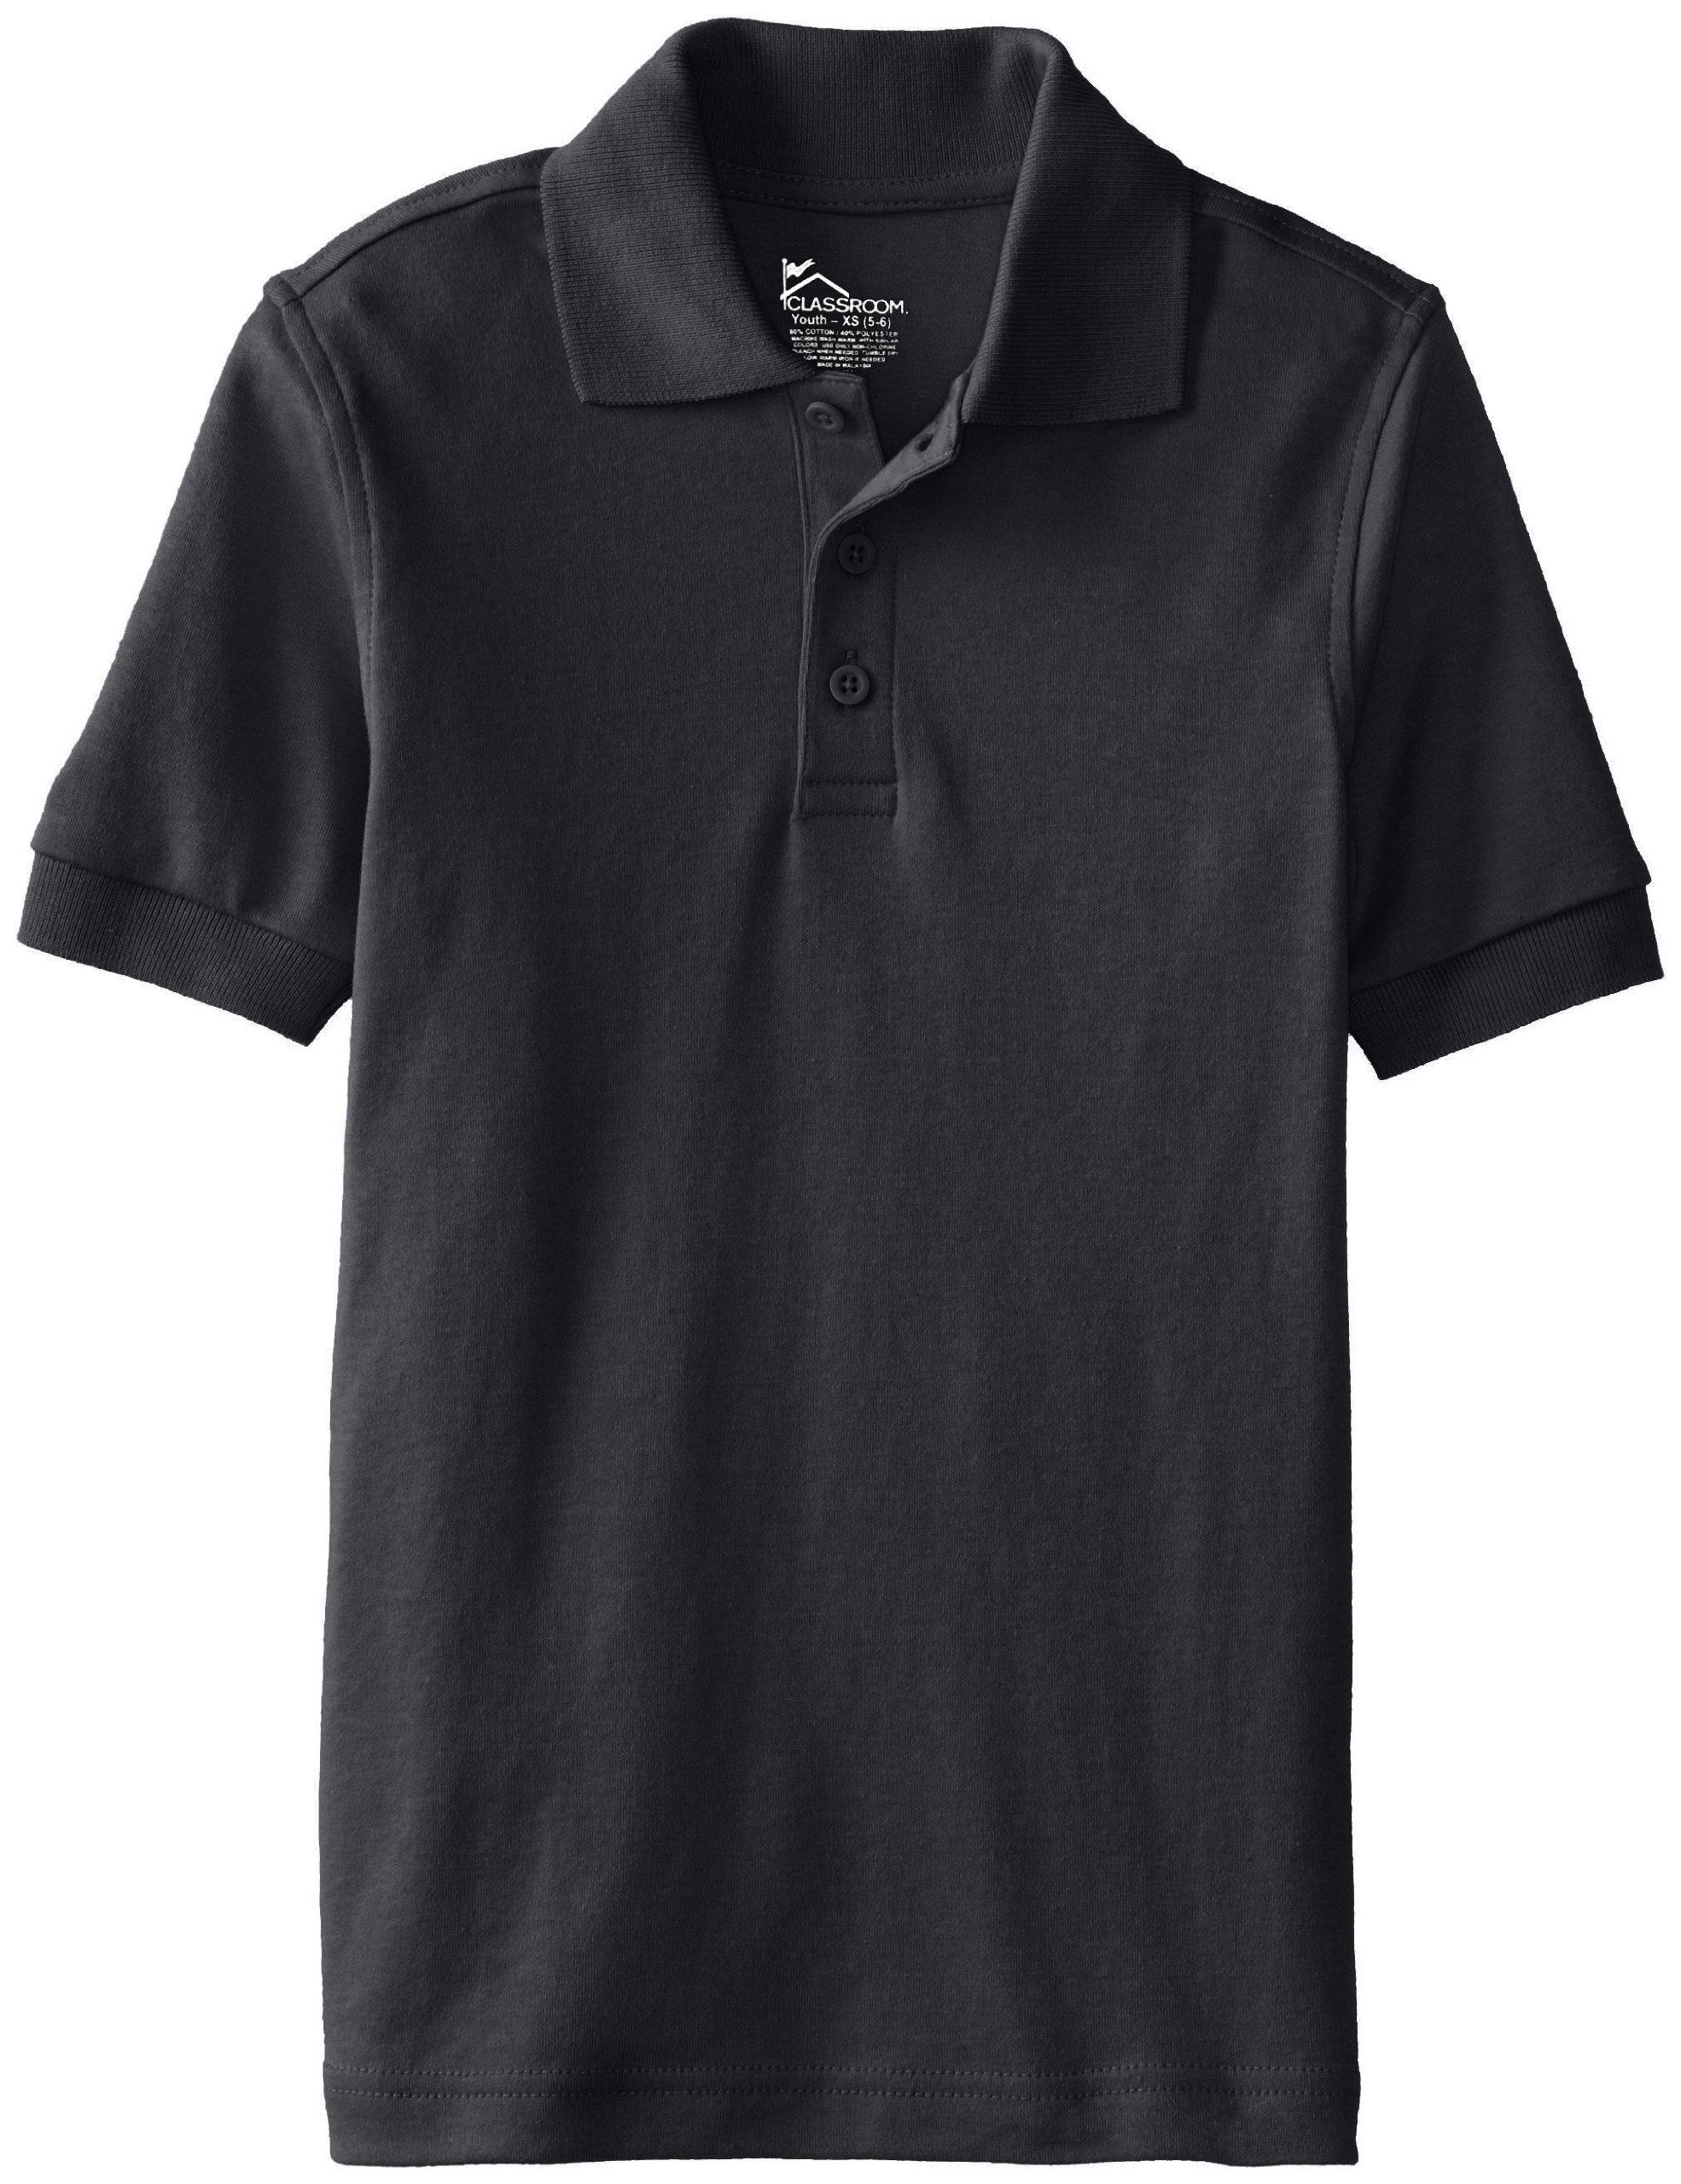 CLASSROOM Little Boys' Uniform Short Sleeve Interlock Polo, Black, Small